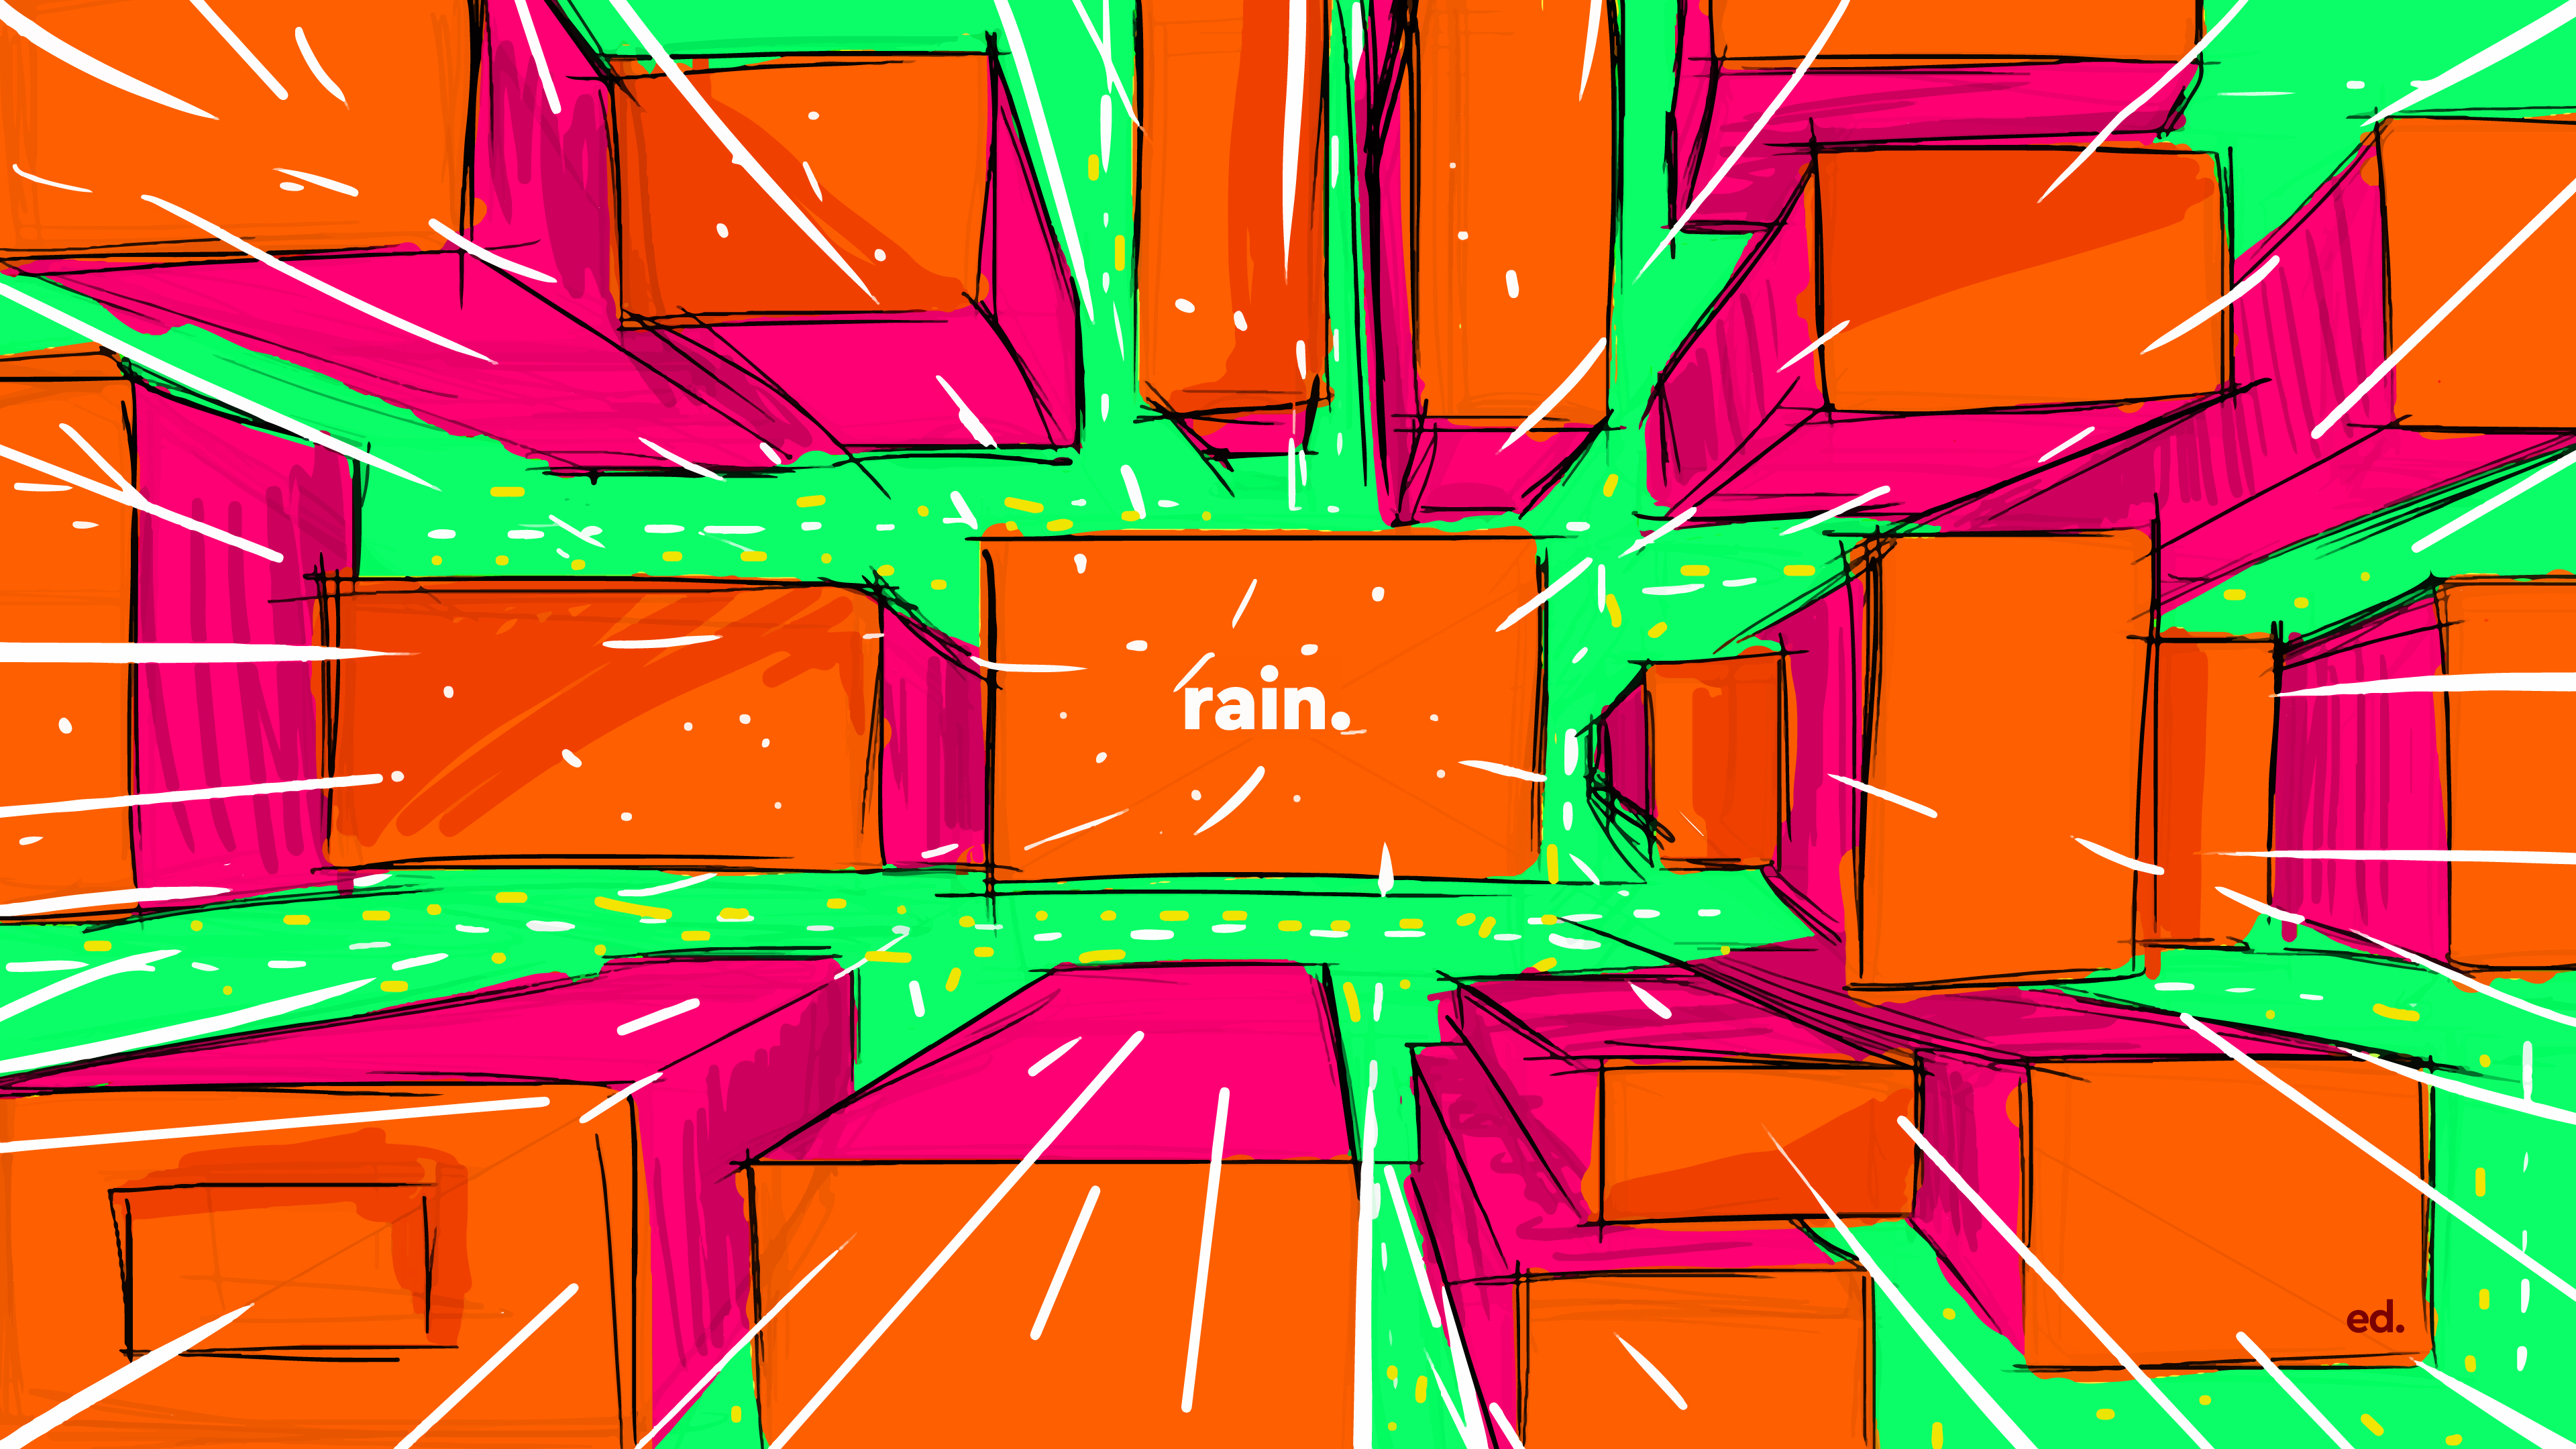 rain by ed